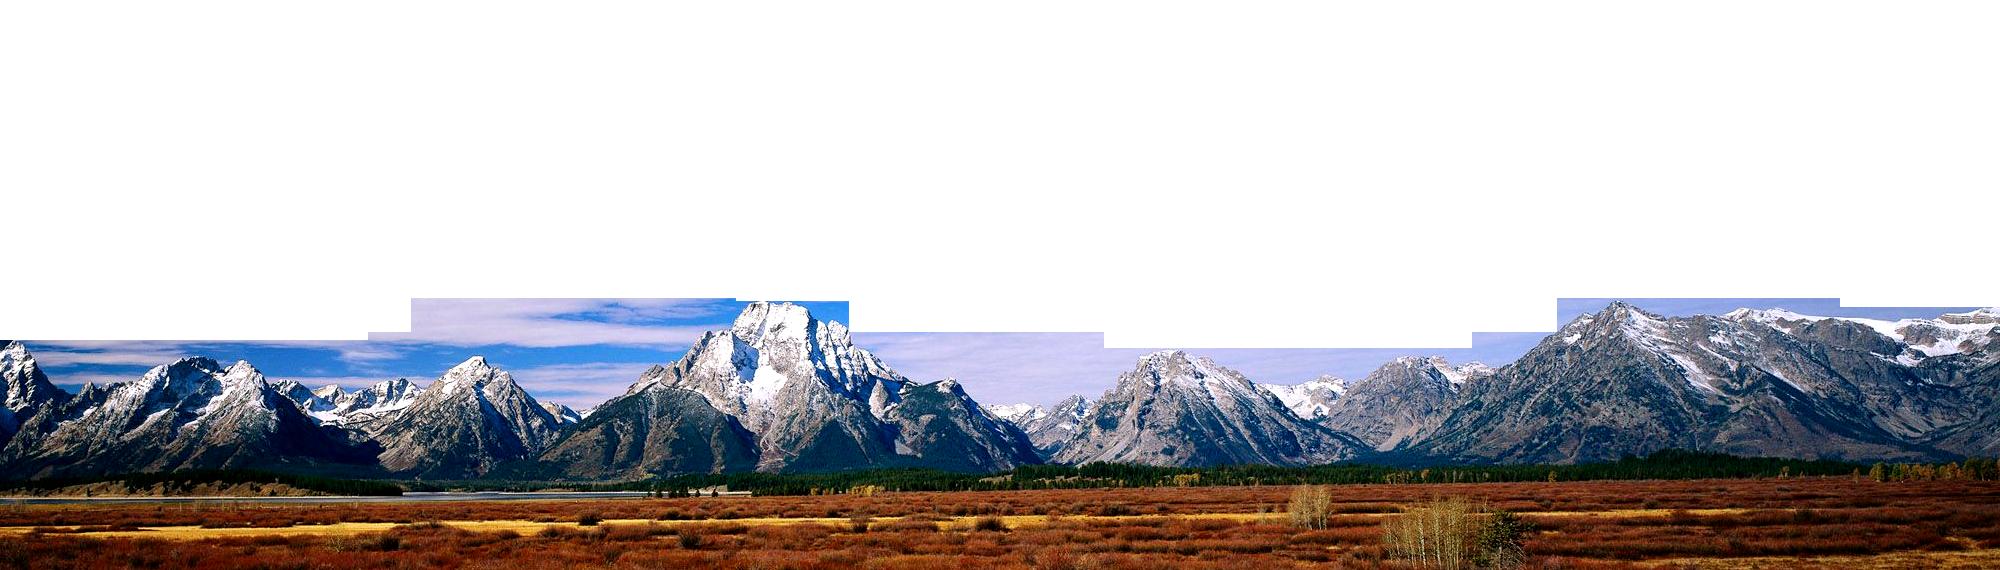 Mountains PNG Photos - PNG HD Mountain Range